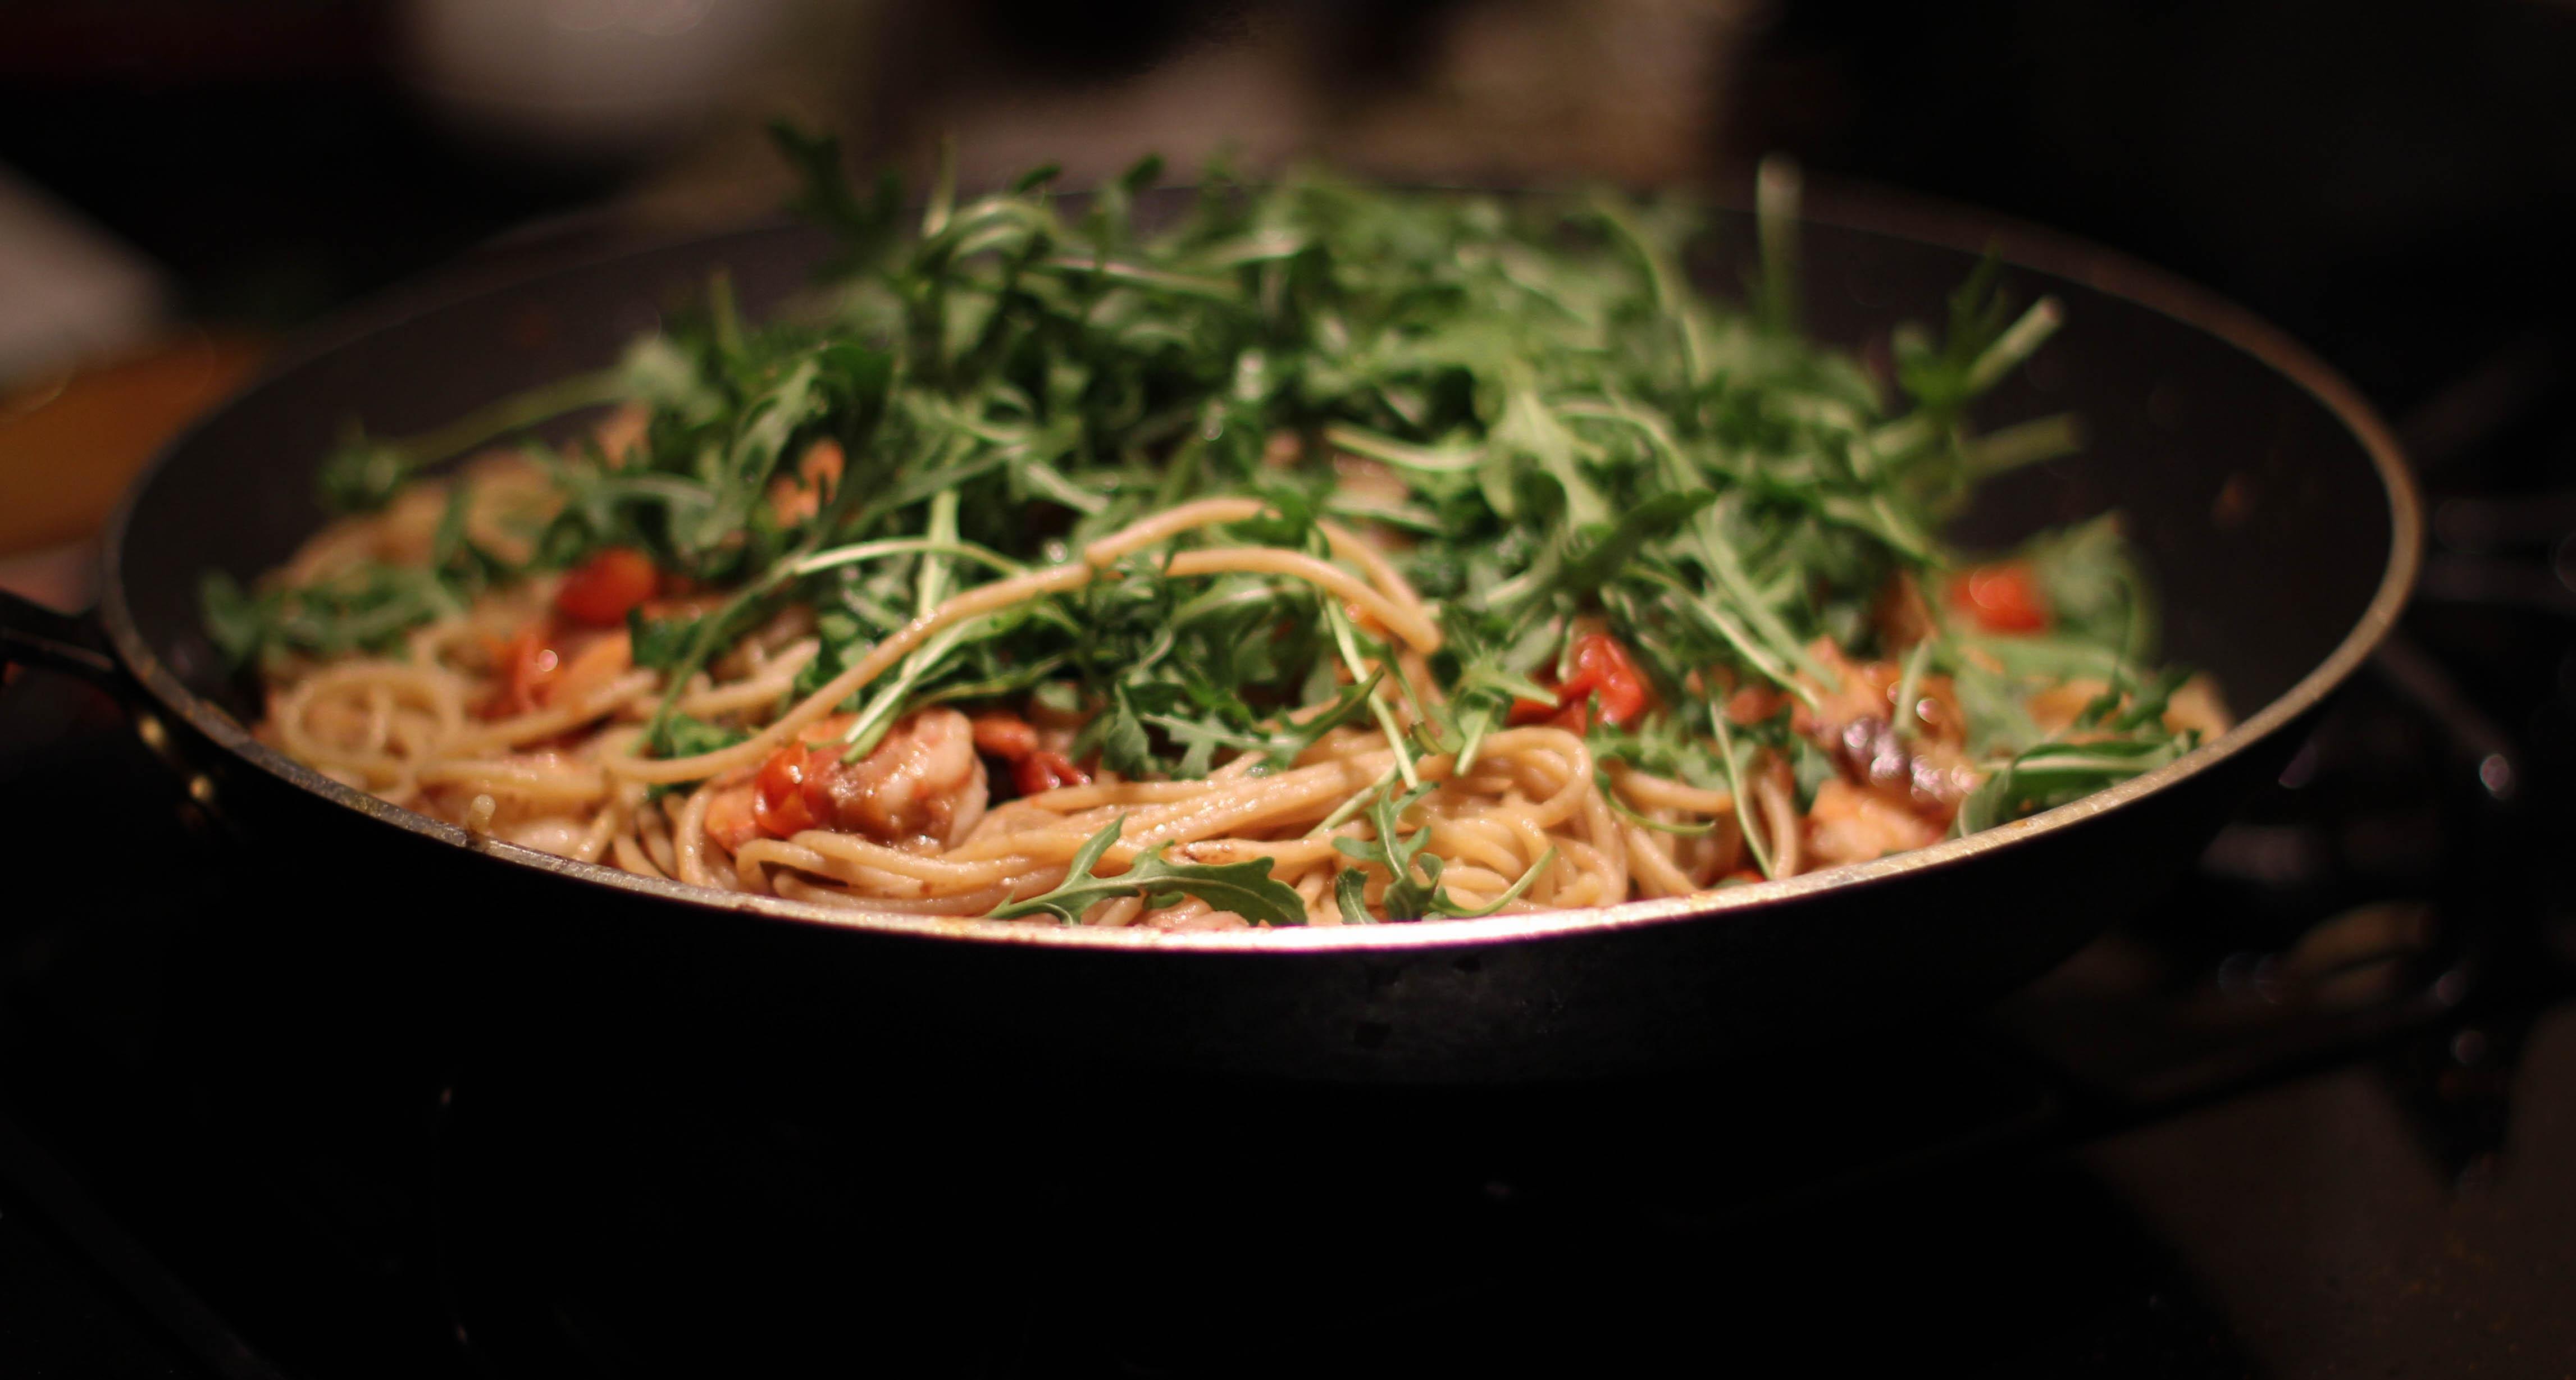 Shrimp and Arugula Pasta